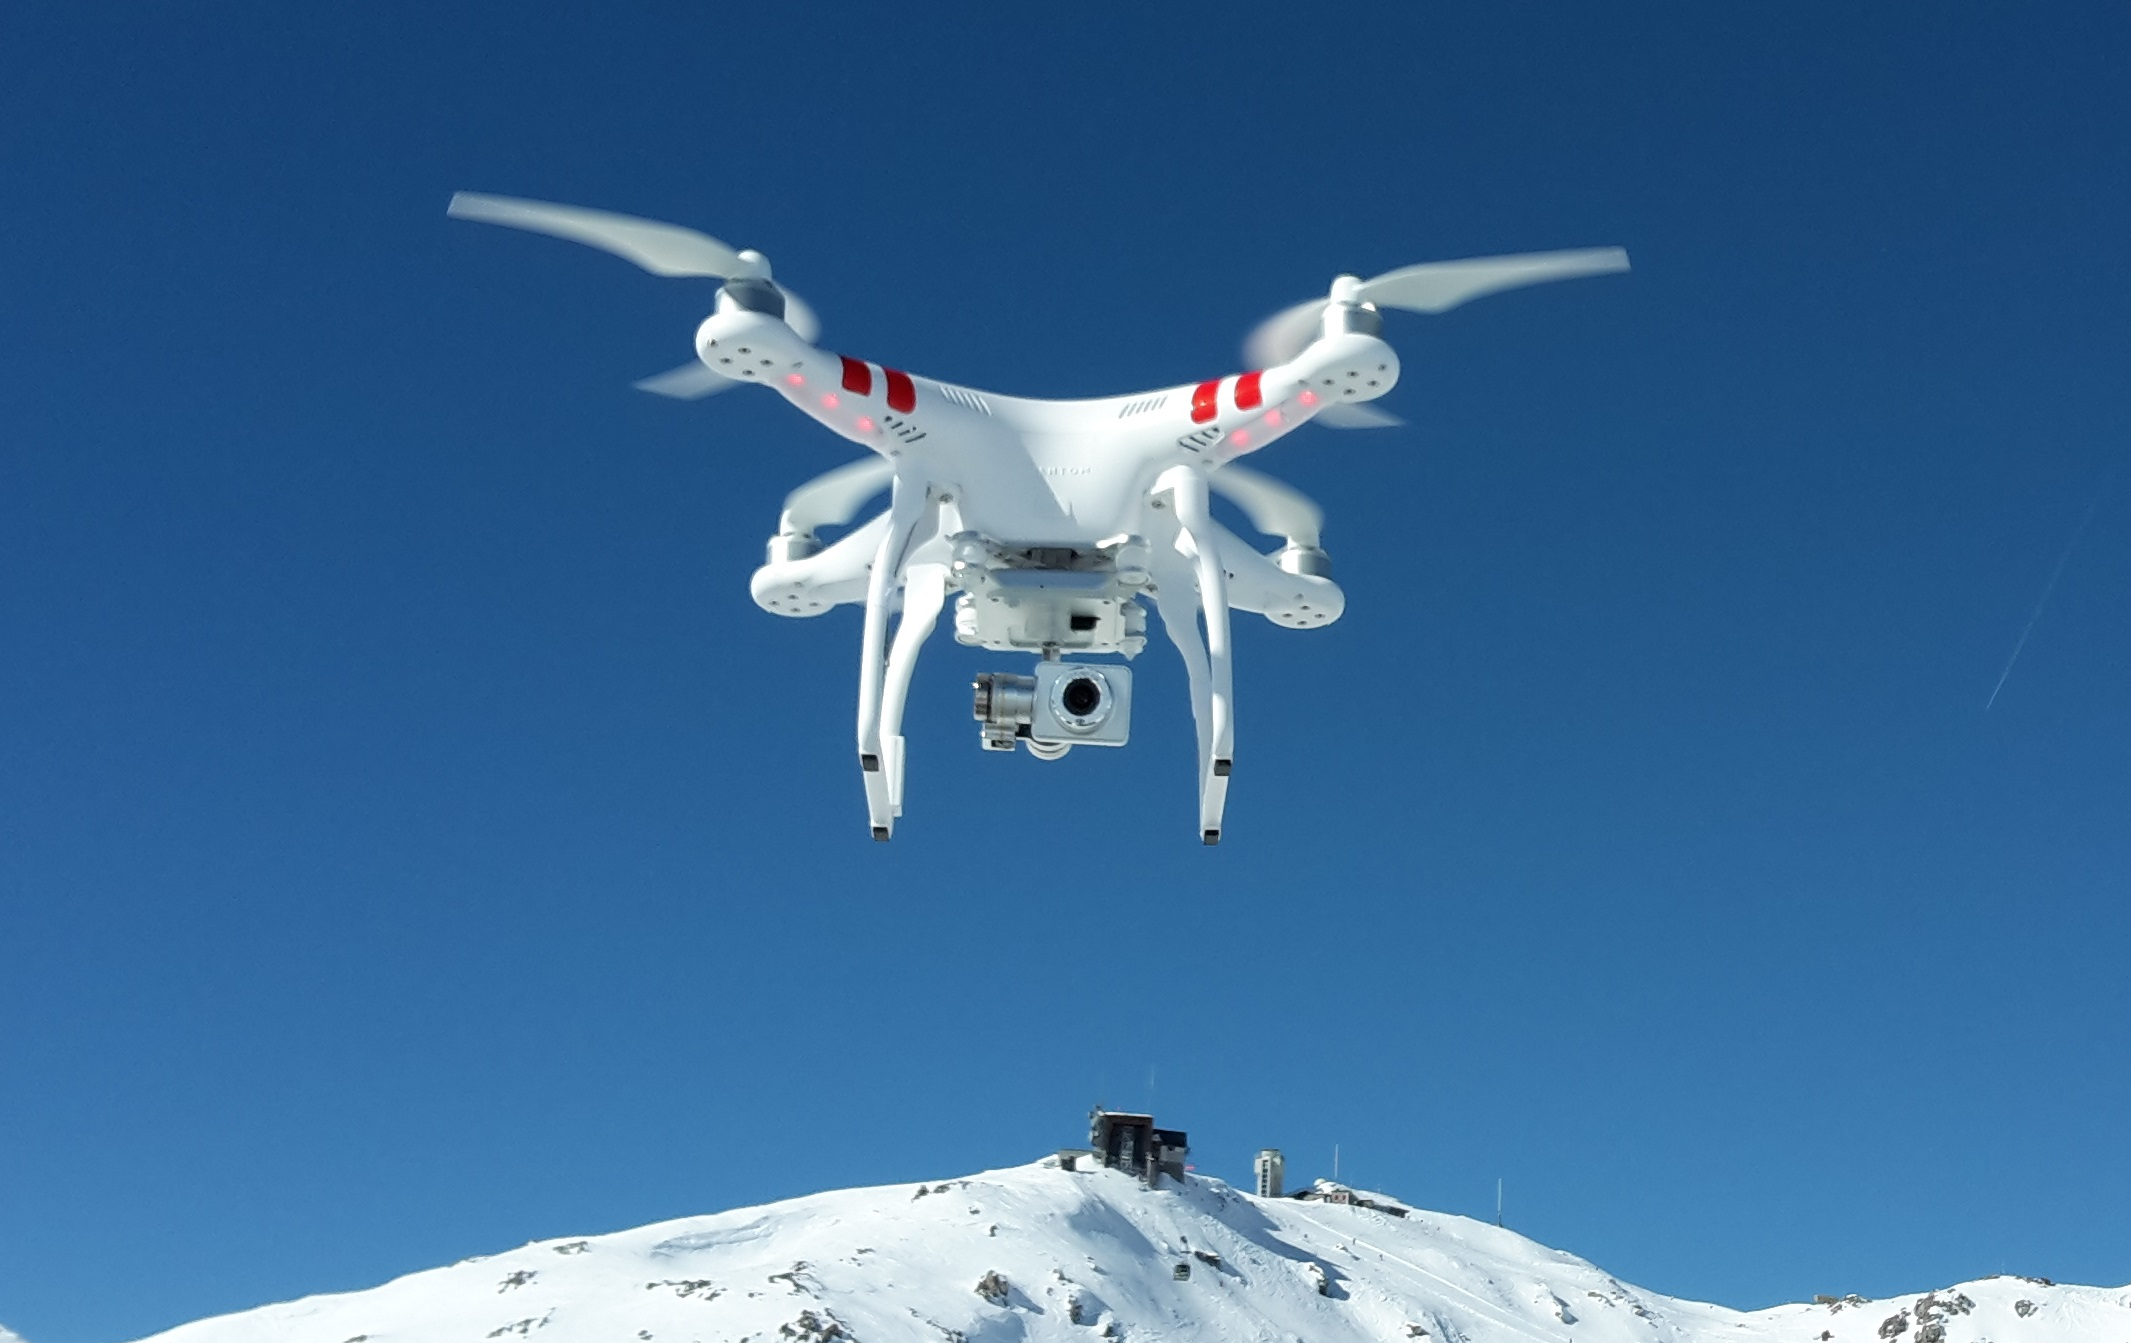 drone regulations Image Credits:Wikipedia